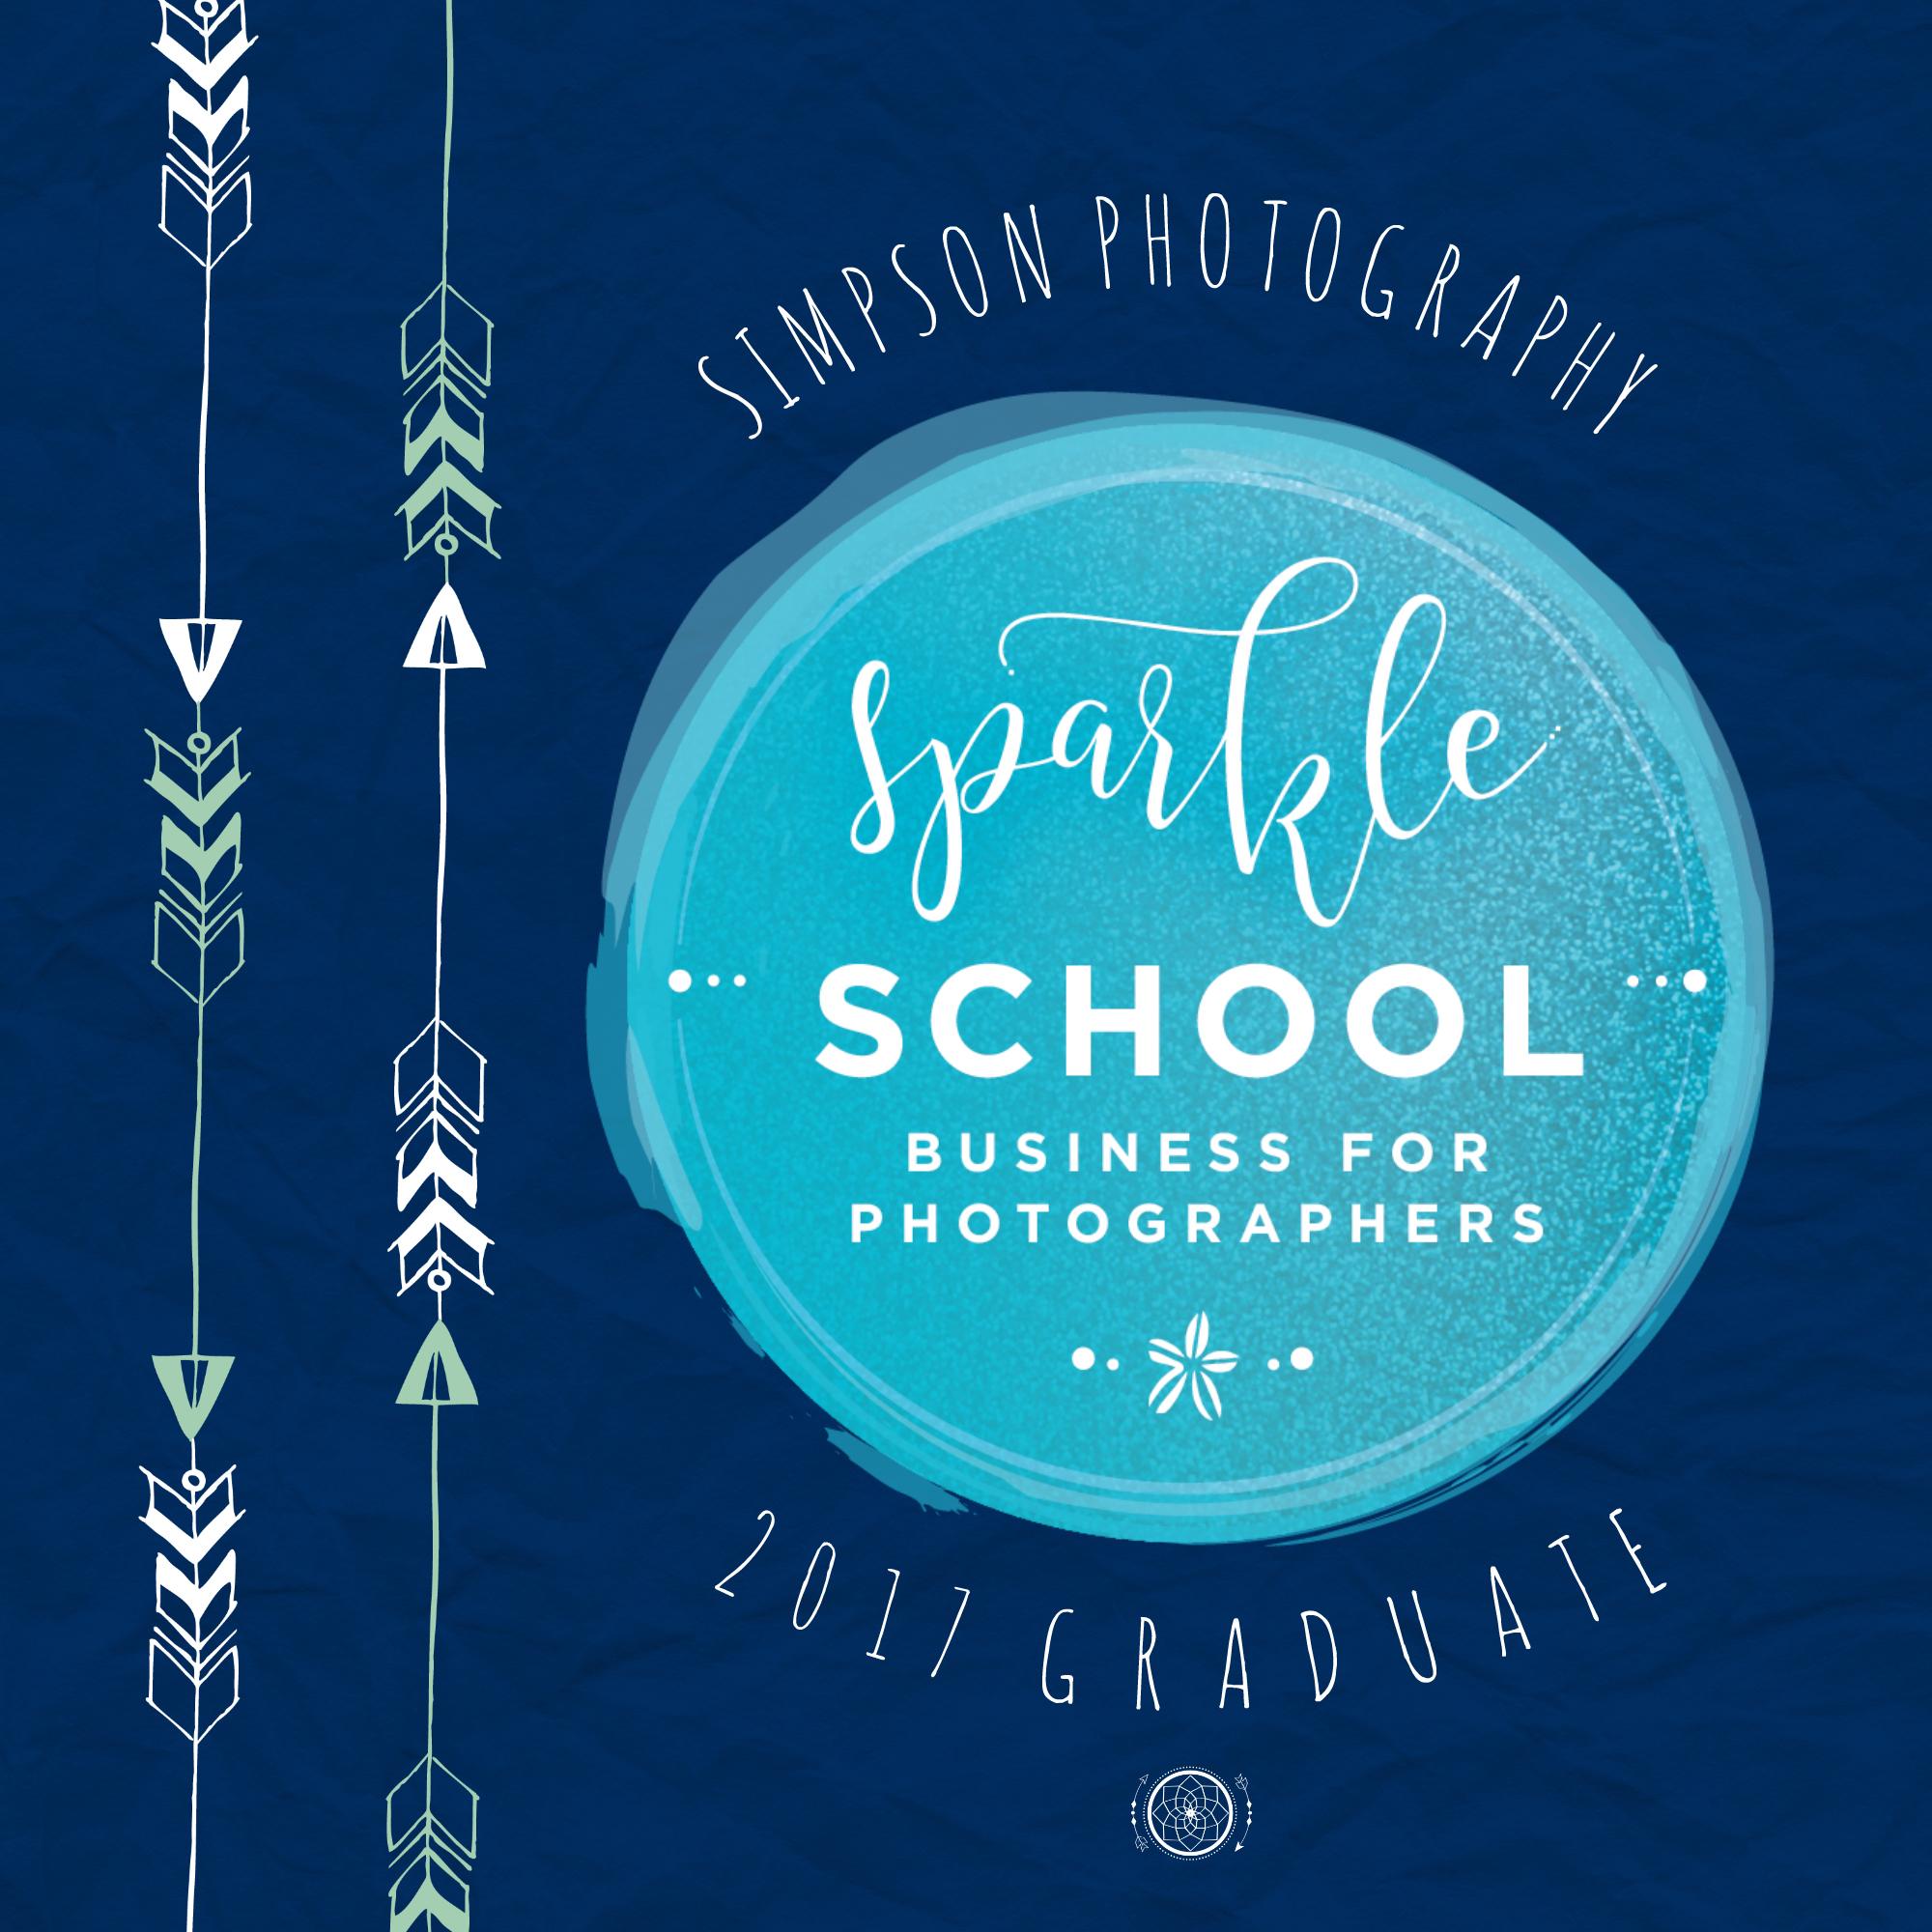 SPARKLE_SCHOOL_GRAD.jpg